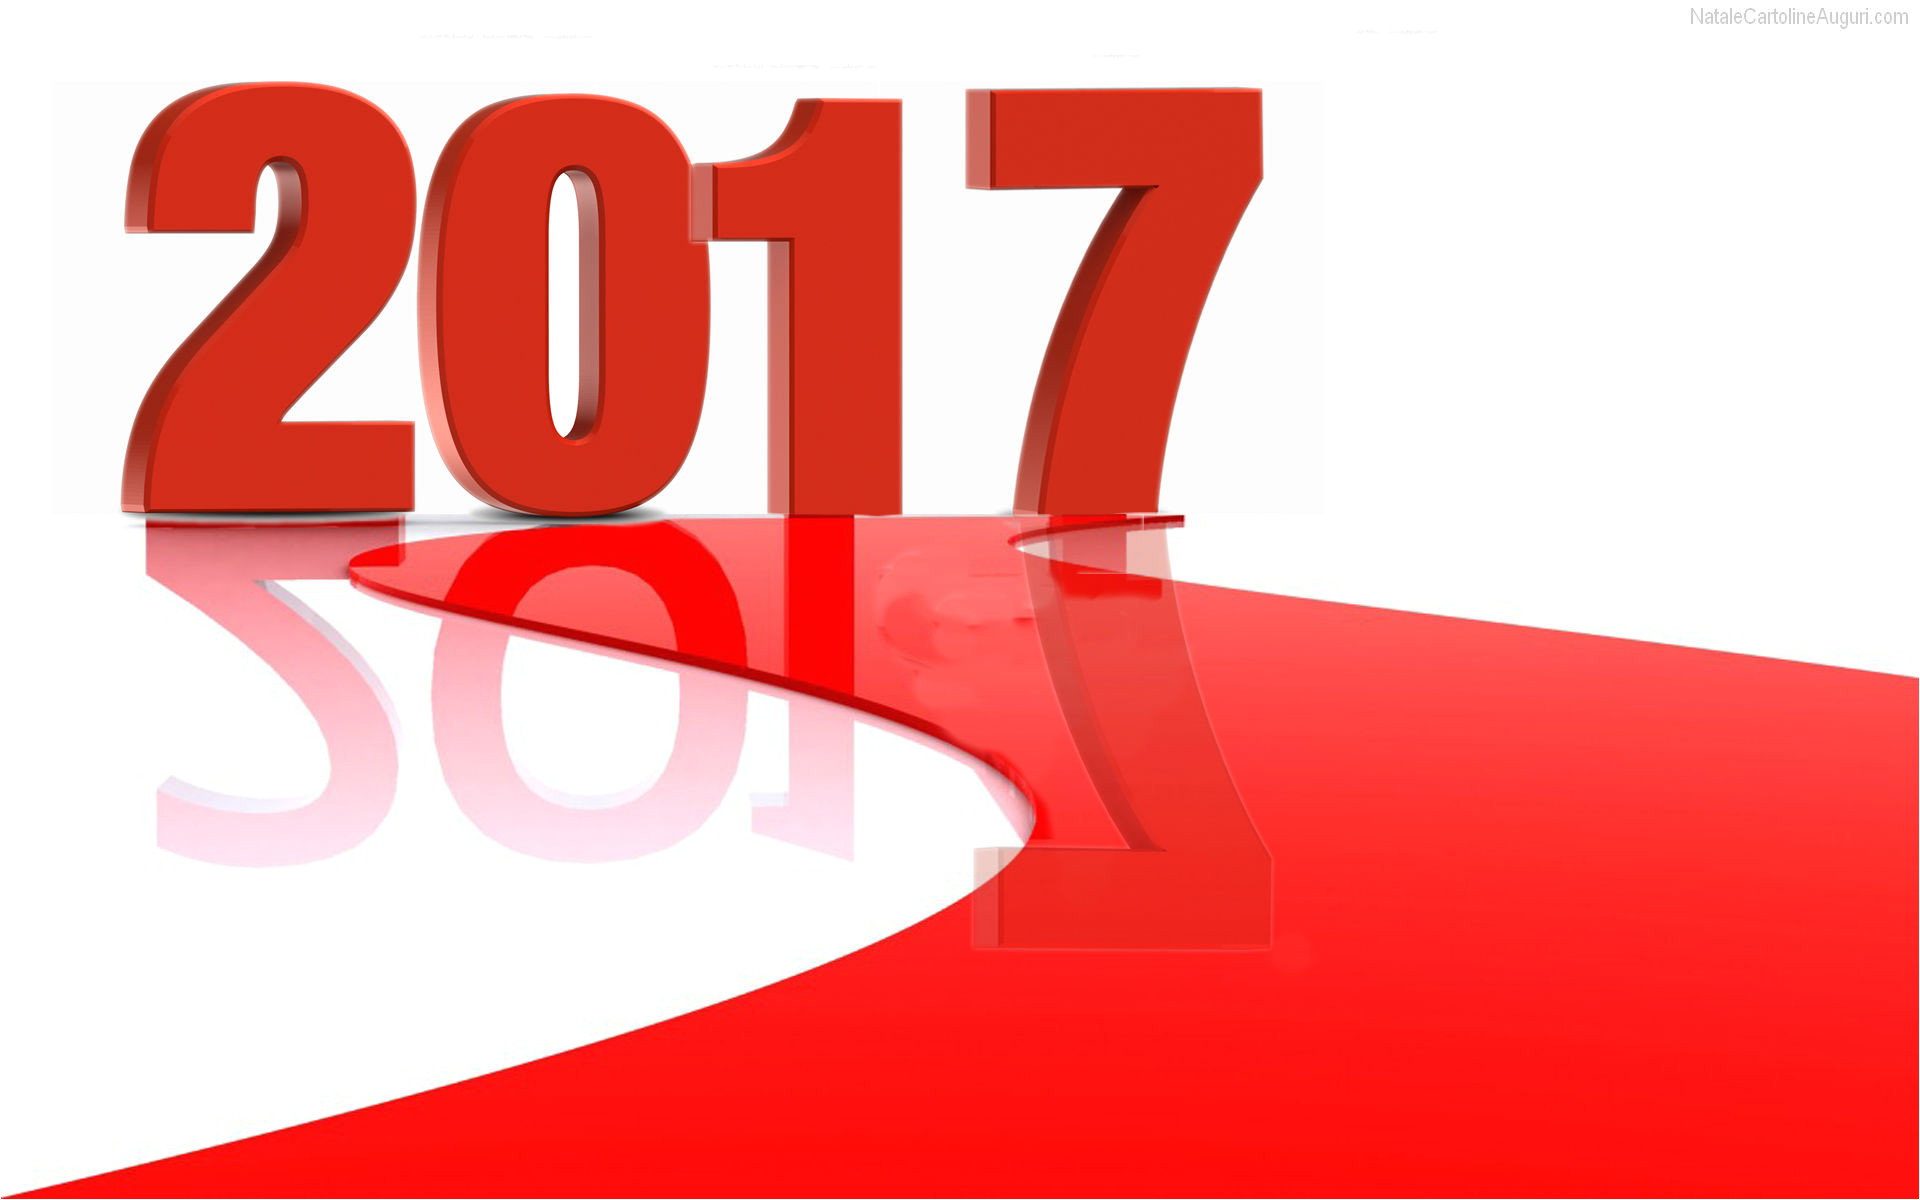 2017 price per pound refrigerant